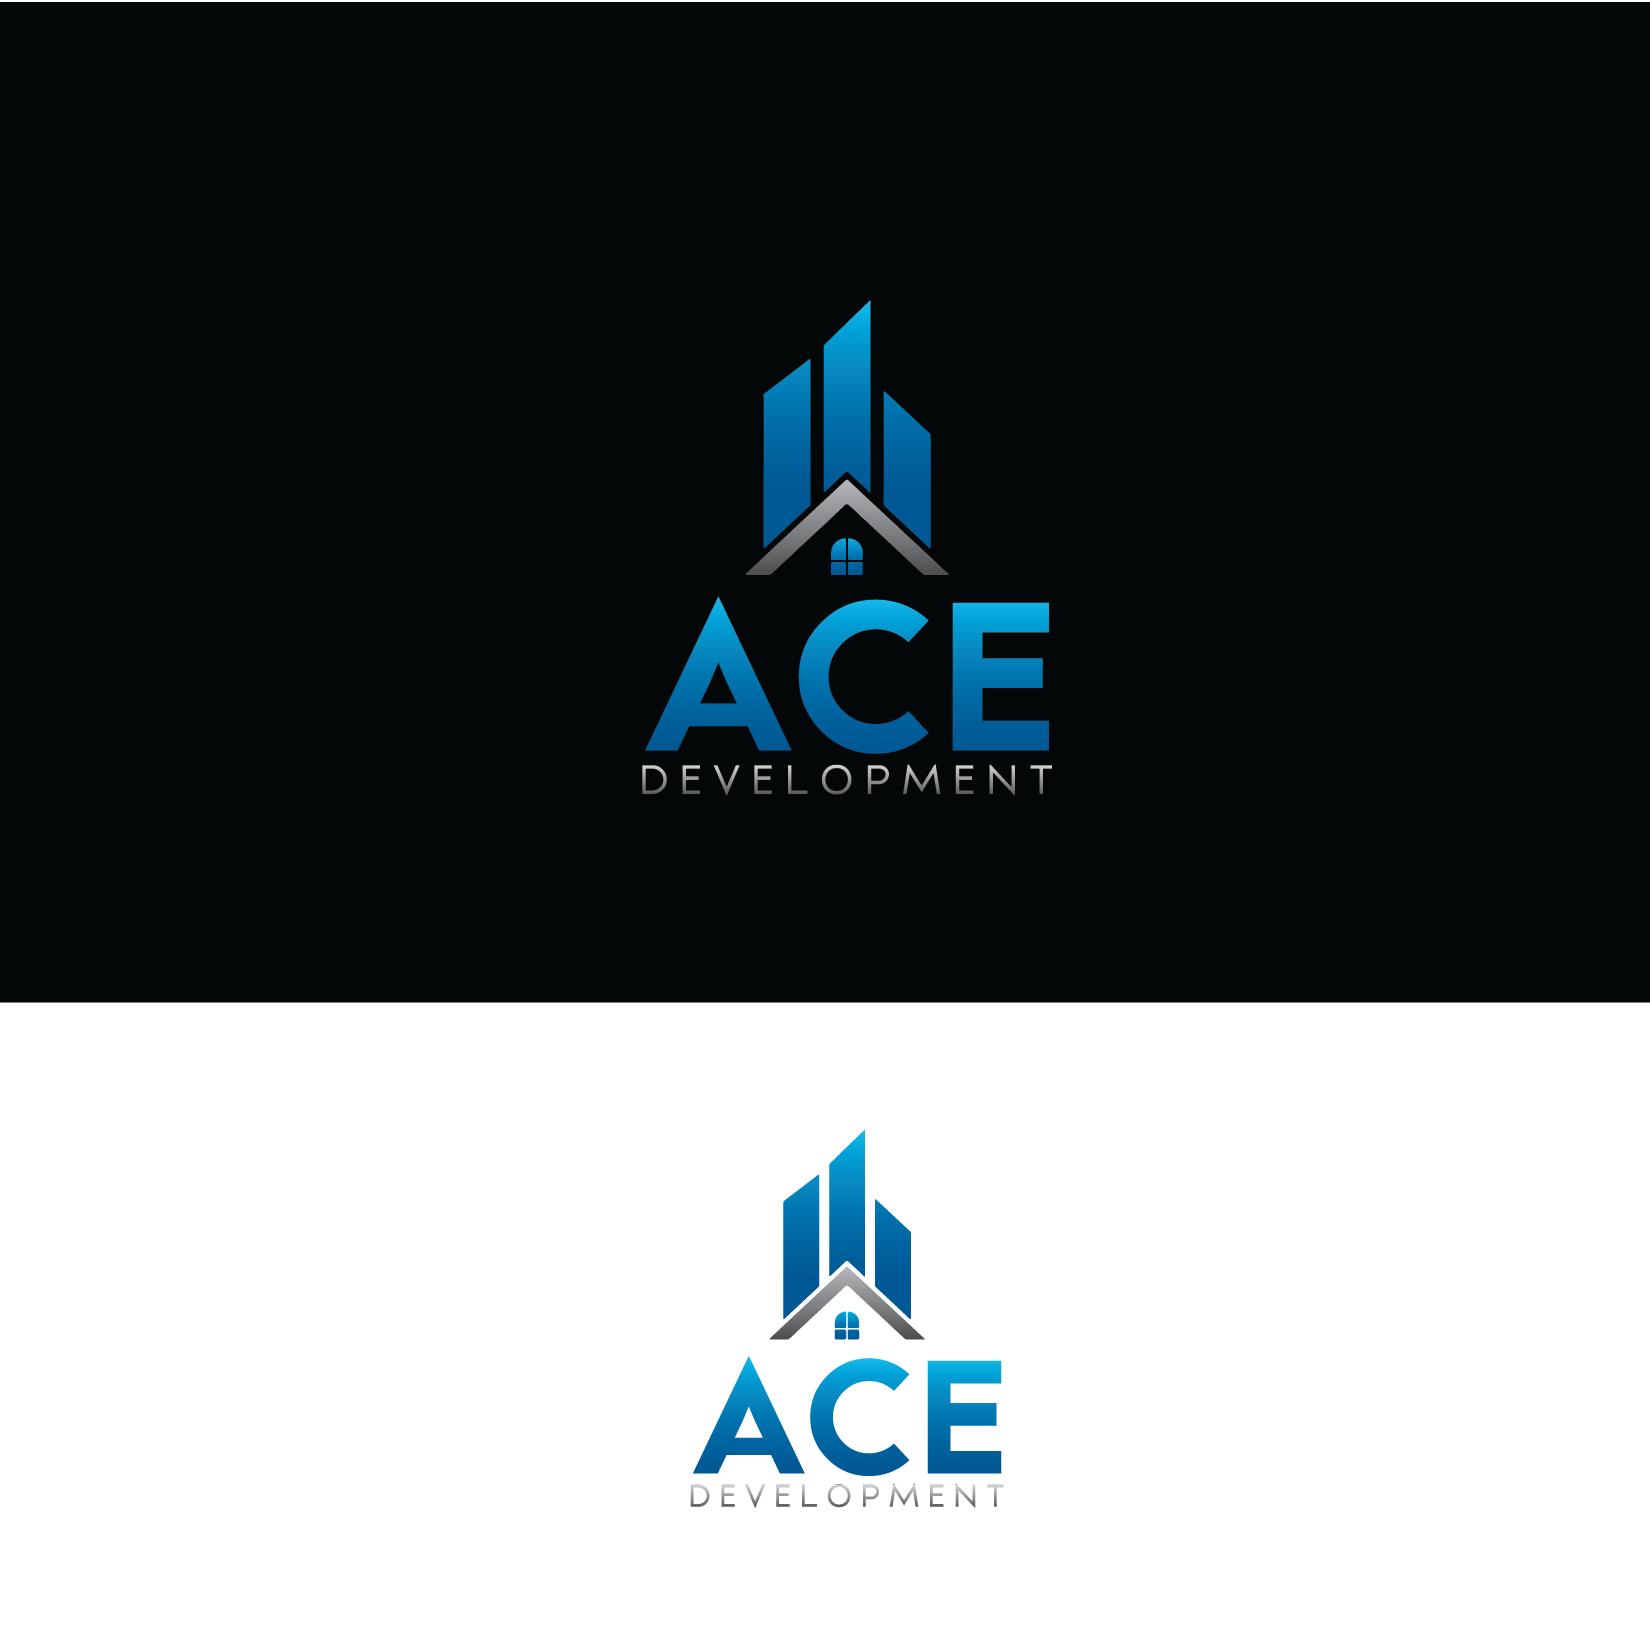 Logo Design by Private User - Entry No. 116 in the Logo Design Contest Fun Logo Design for Ace development.